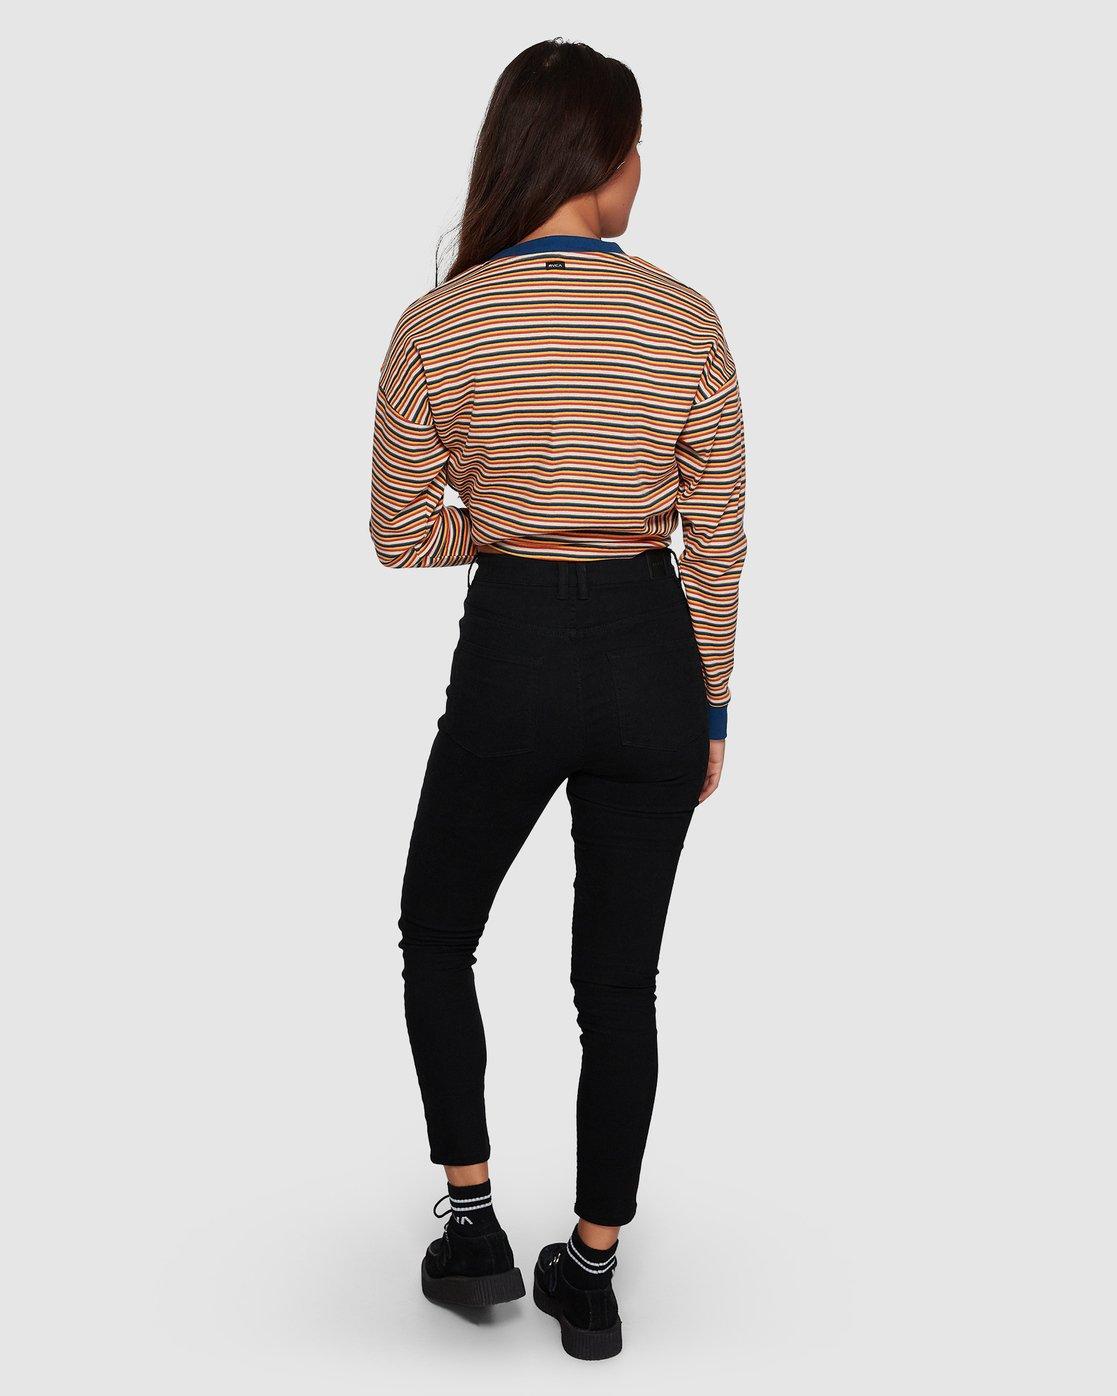 3 Solar Pants - Black Black  R283229 RVCA